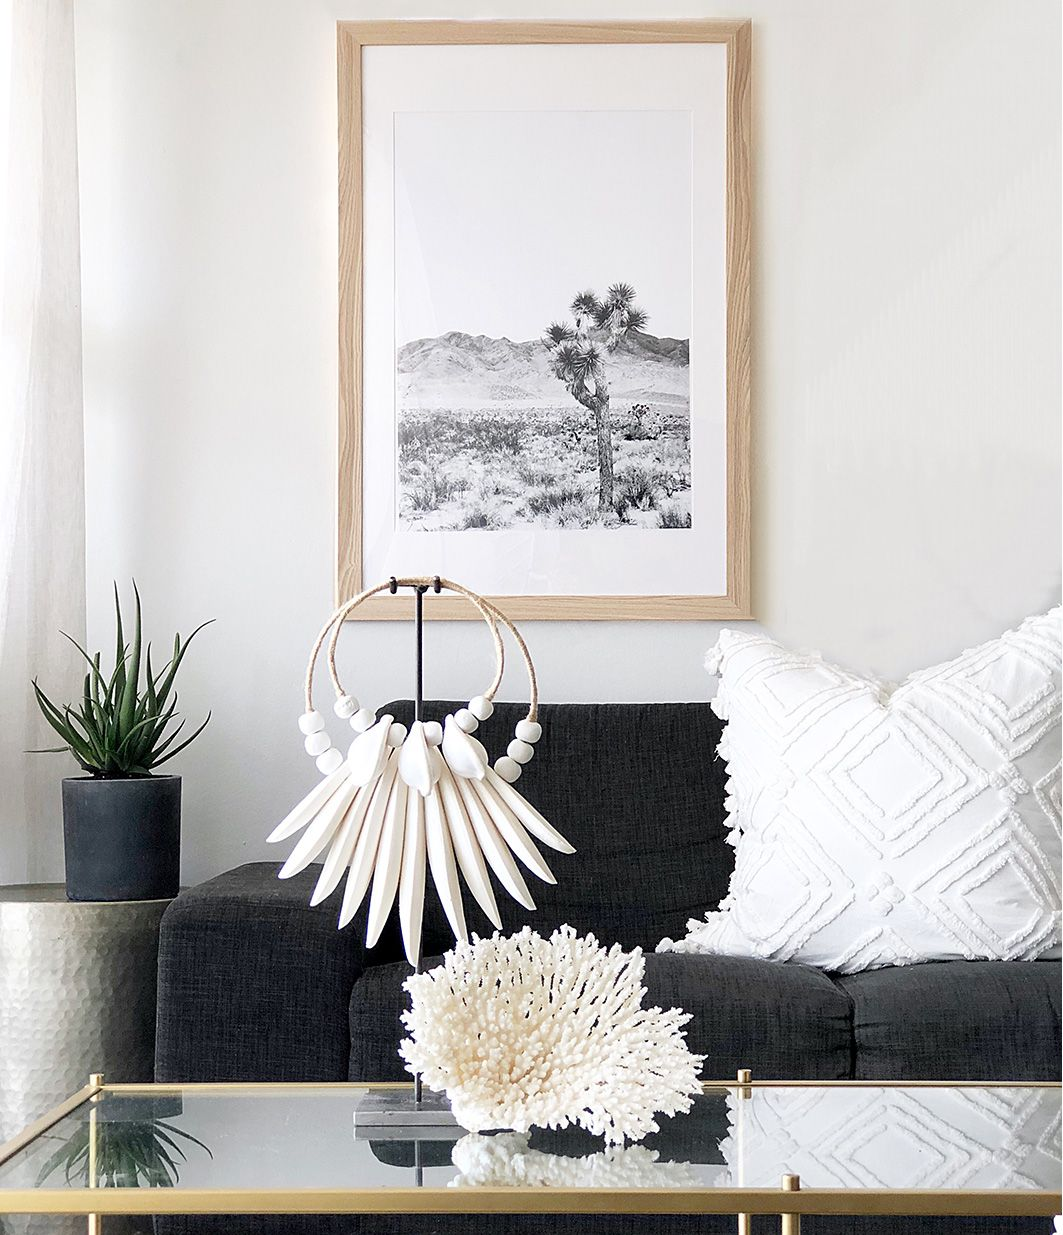 Joshua Tree Print Black And White In 2020 Bohemian Room Decor Boho Living Room White Decor